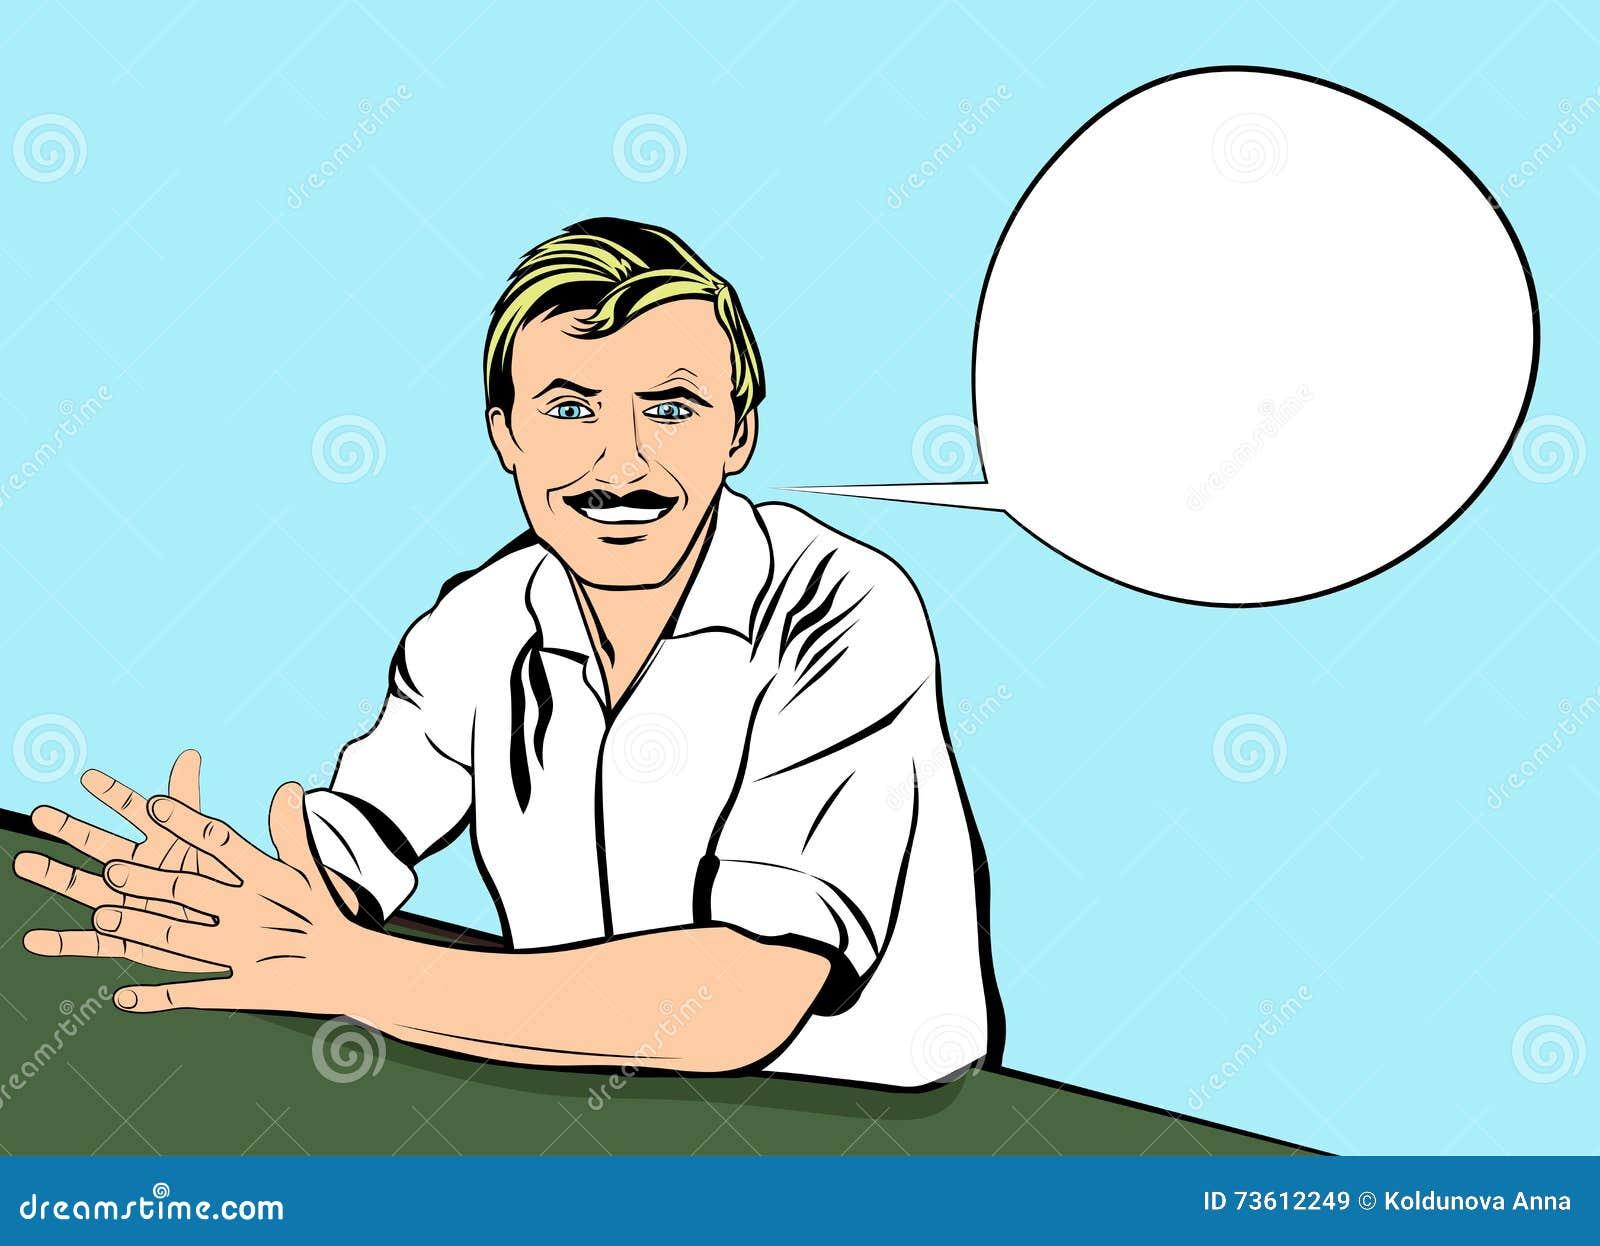 successful job interview in employment bright and colorful vector successful job interview in employment bright and colorful vector pop art style